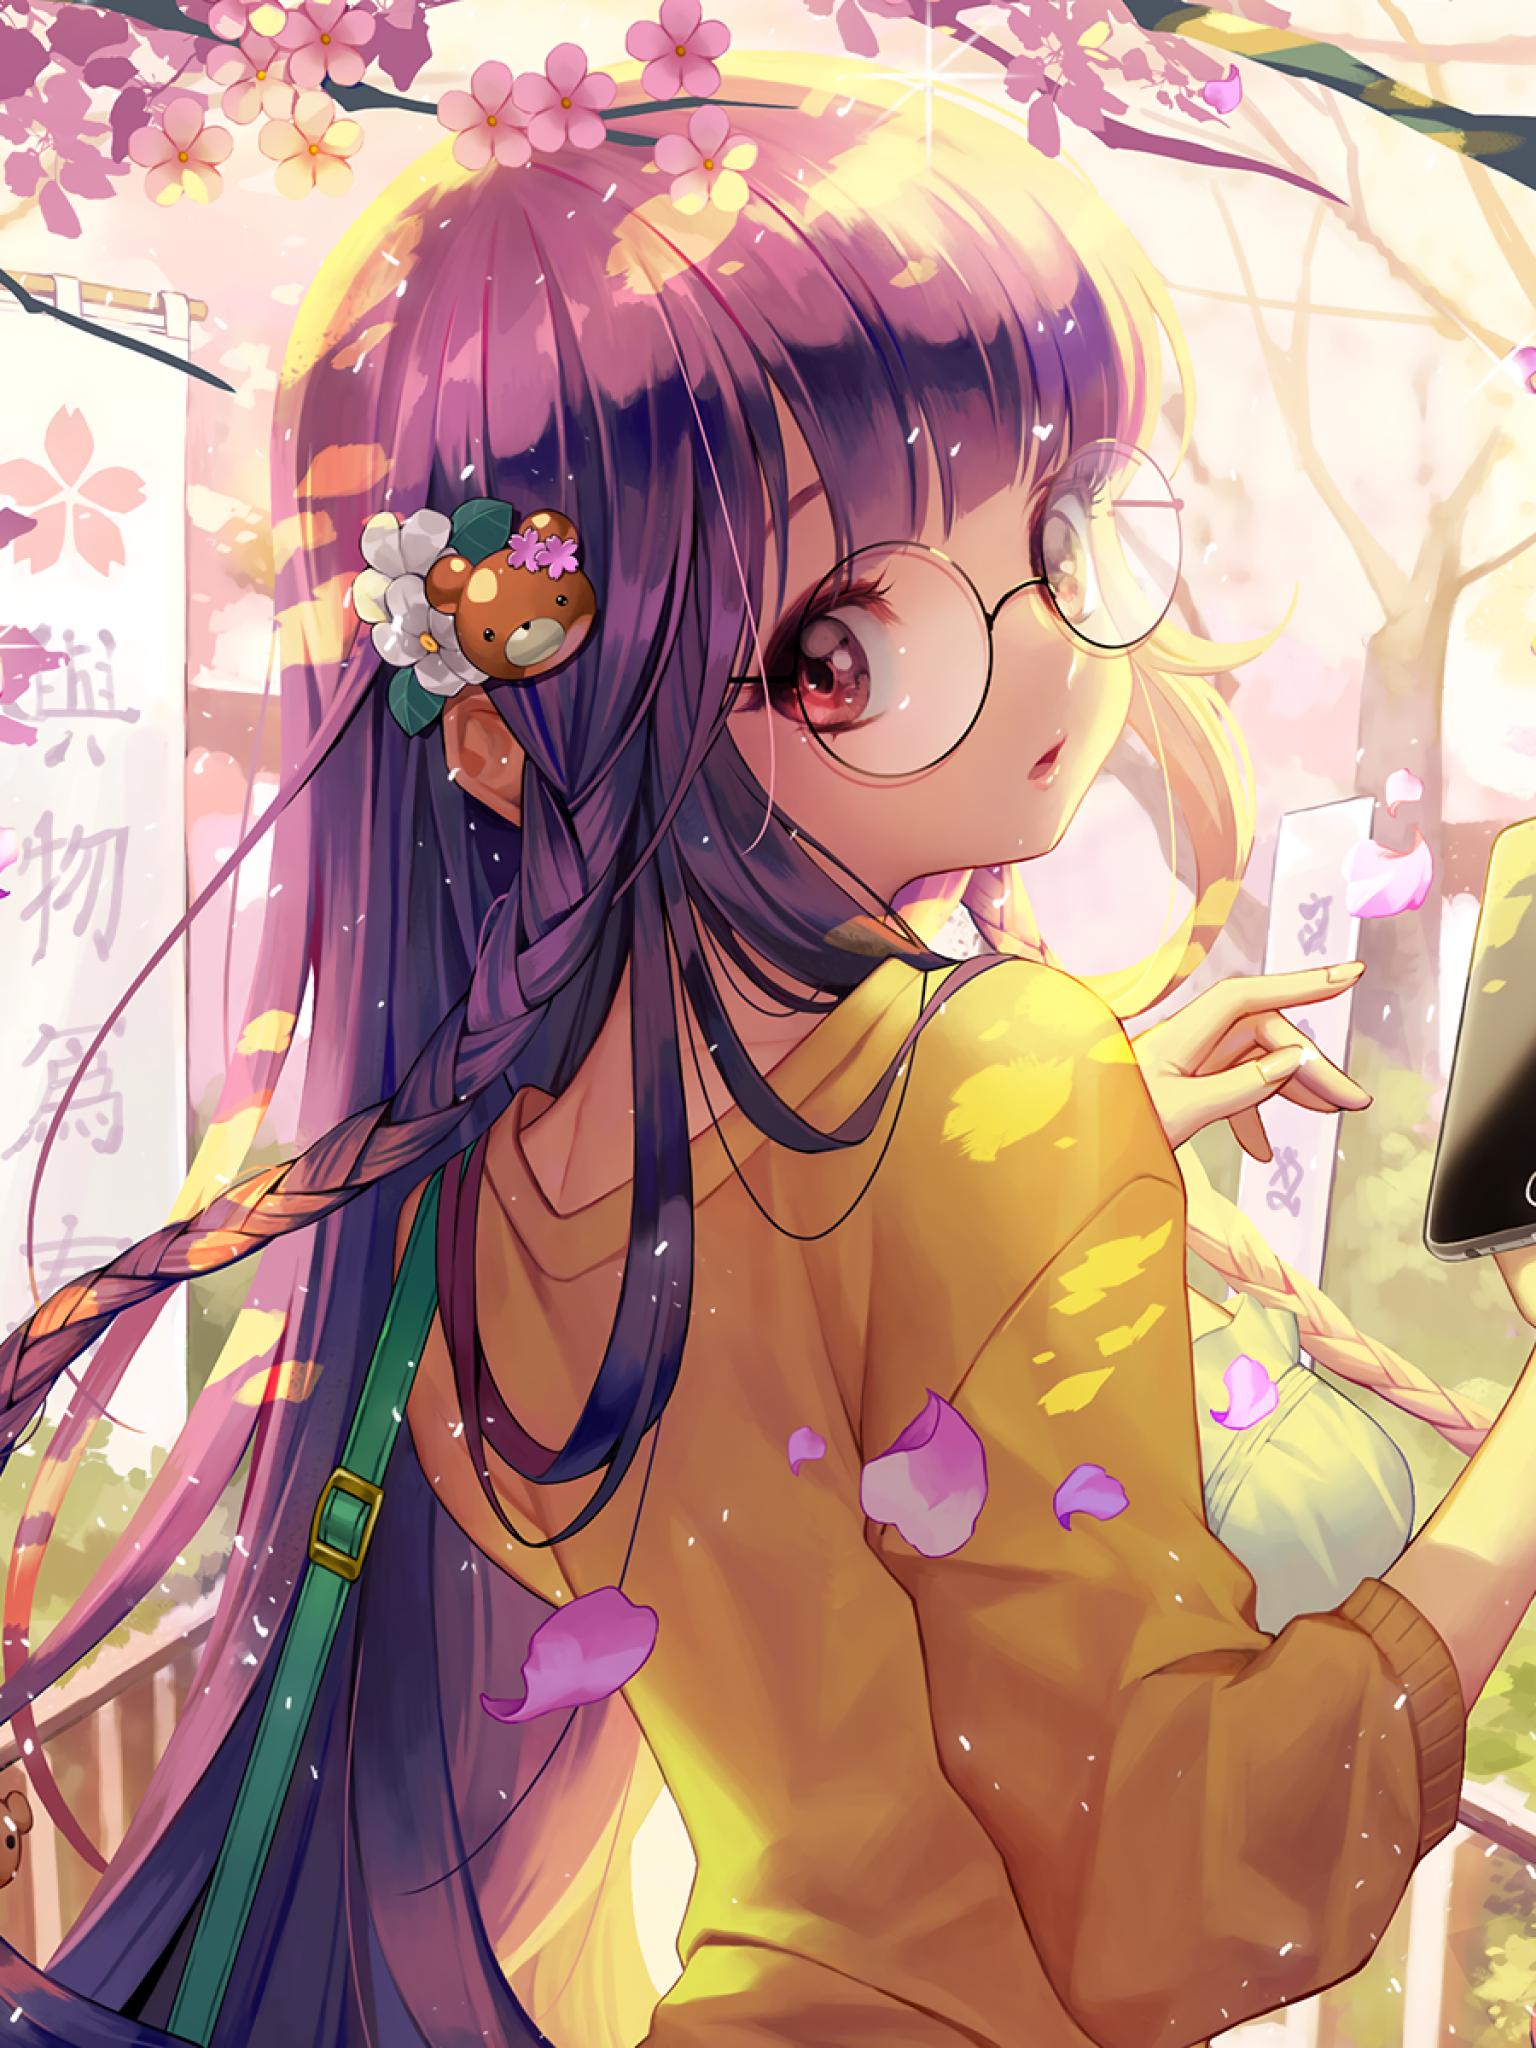 Pics of cute animes